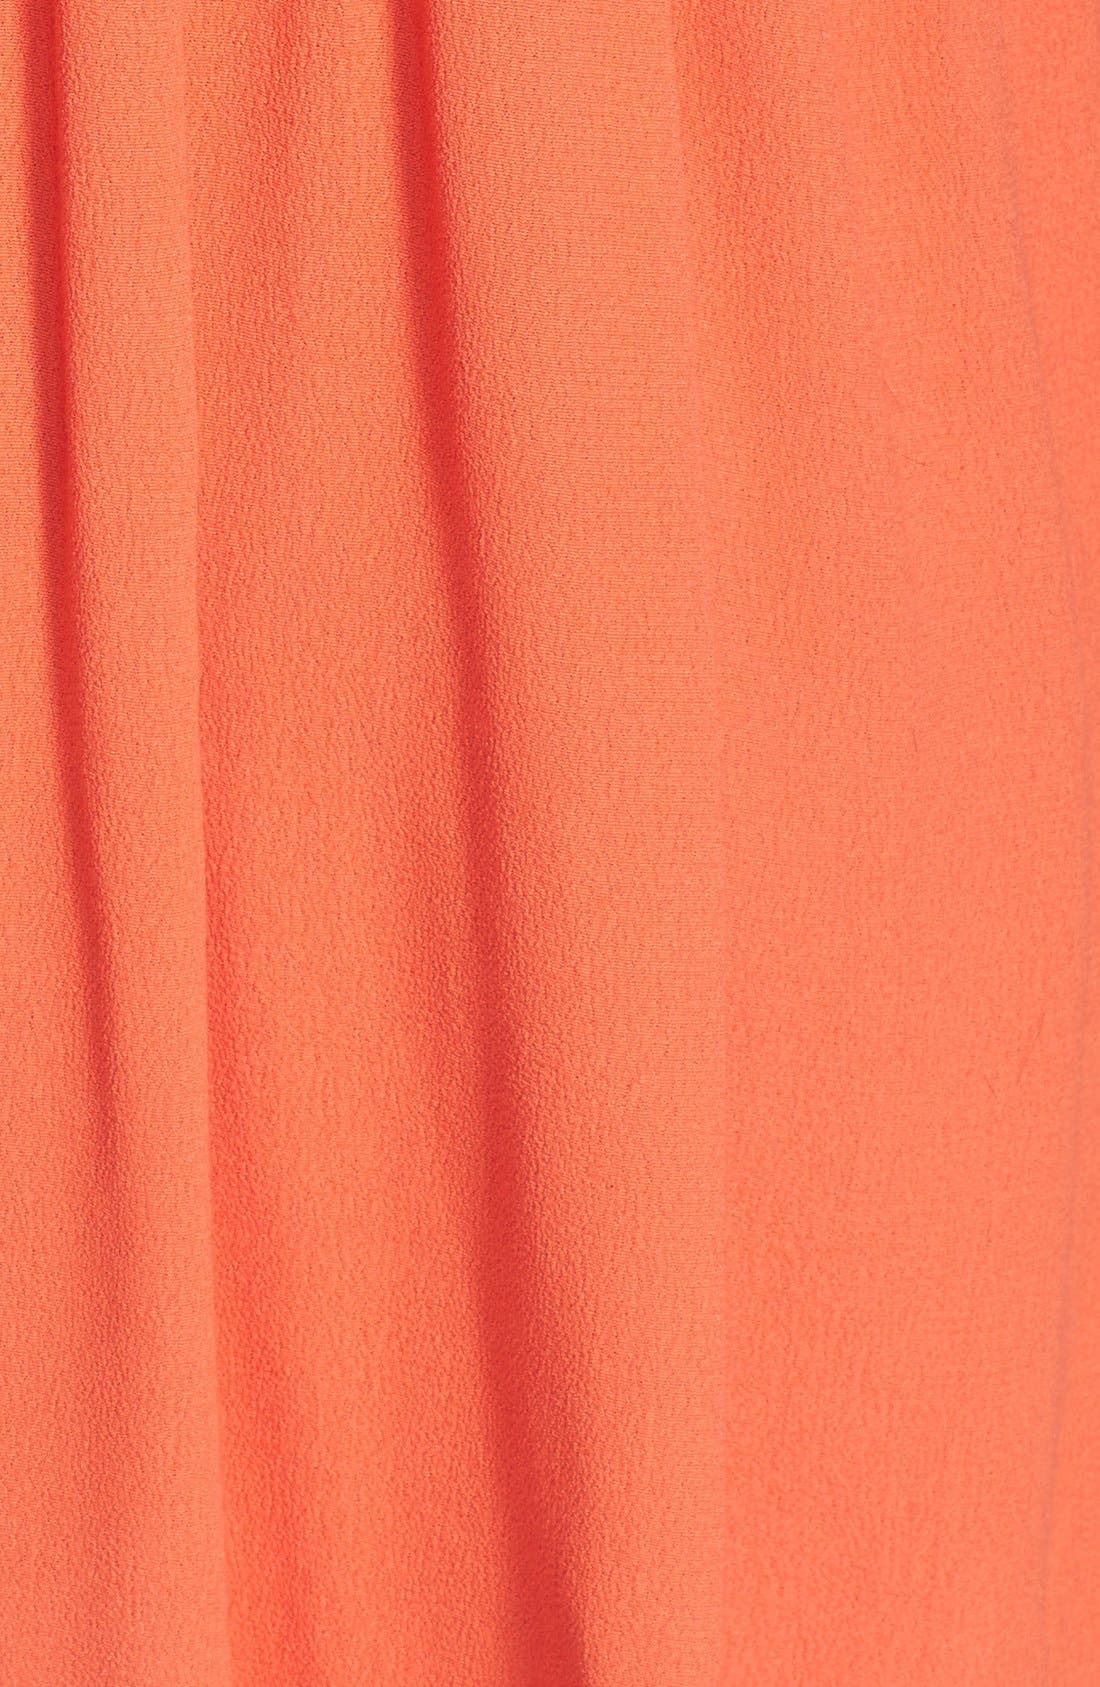 Alternate Image 3  - MINKPINK 'Til I Hear from You' Skater Dress